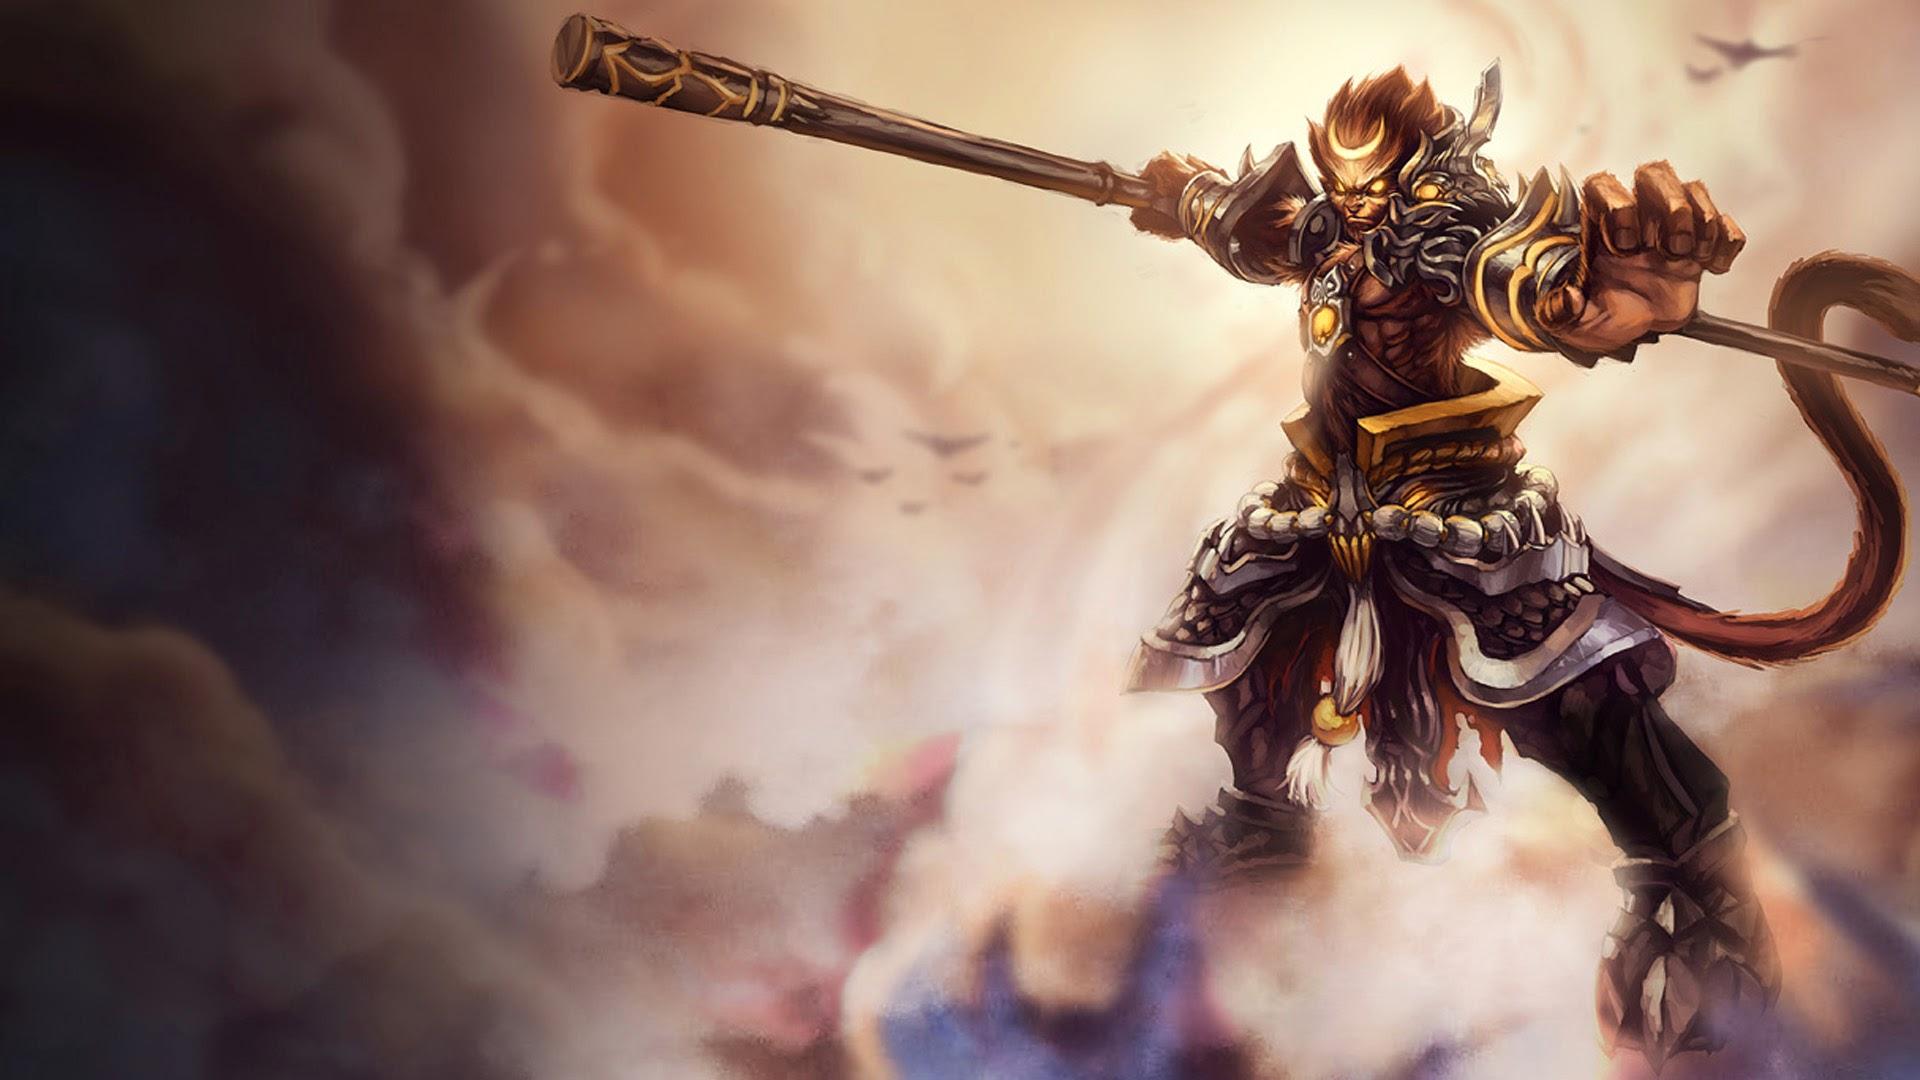 Dota 1 Heroes Wallpaper Hd General Wukong League Of Legends 13 Wallpaper Hd